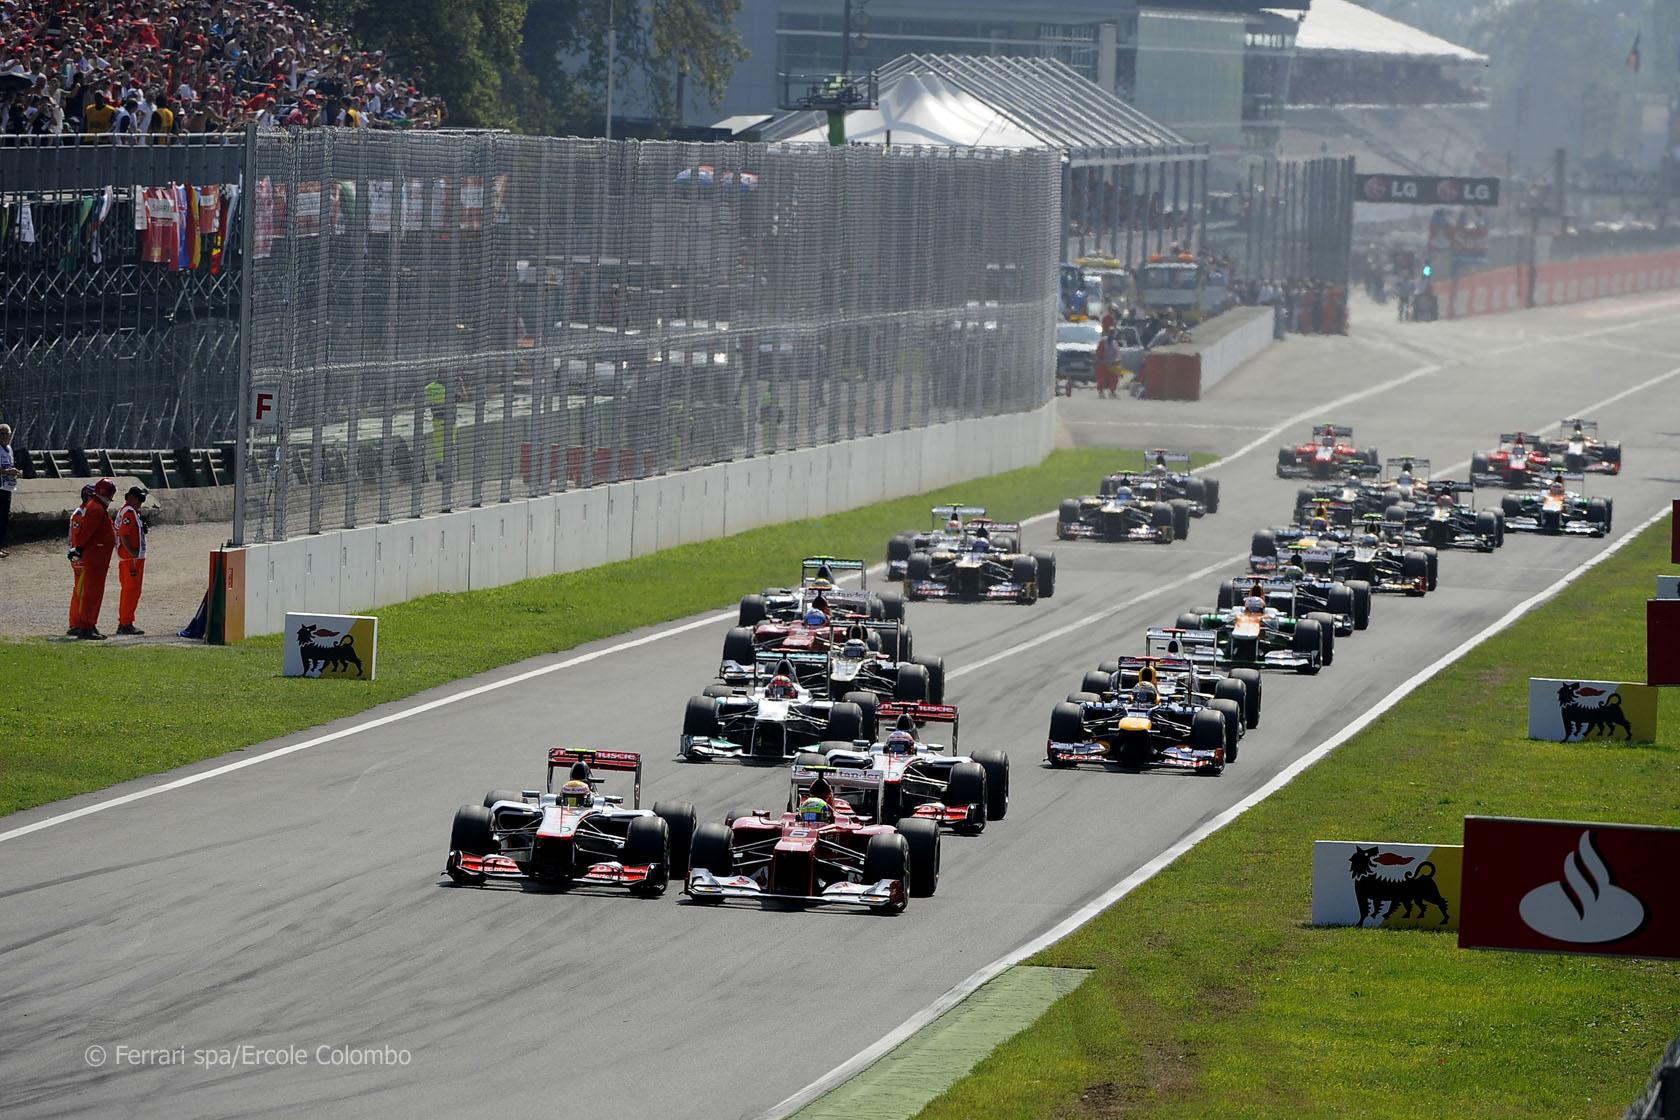 Monza Circuit Could Lose the Italian Grand Prix - GTspirit